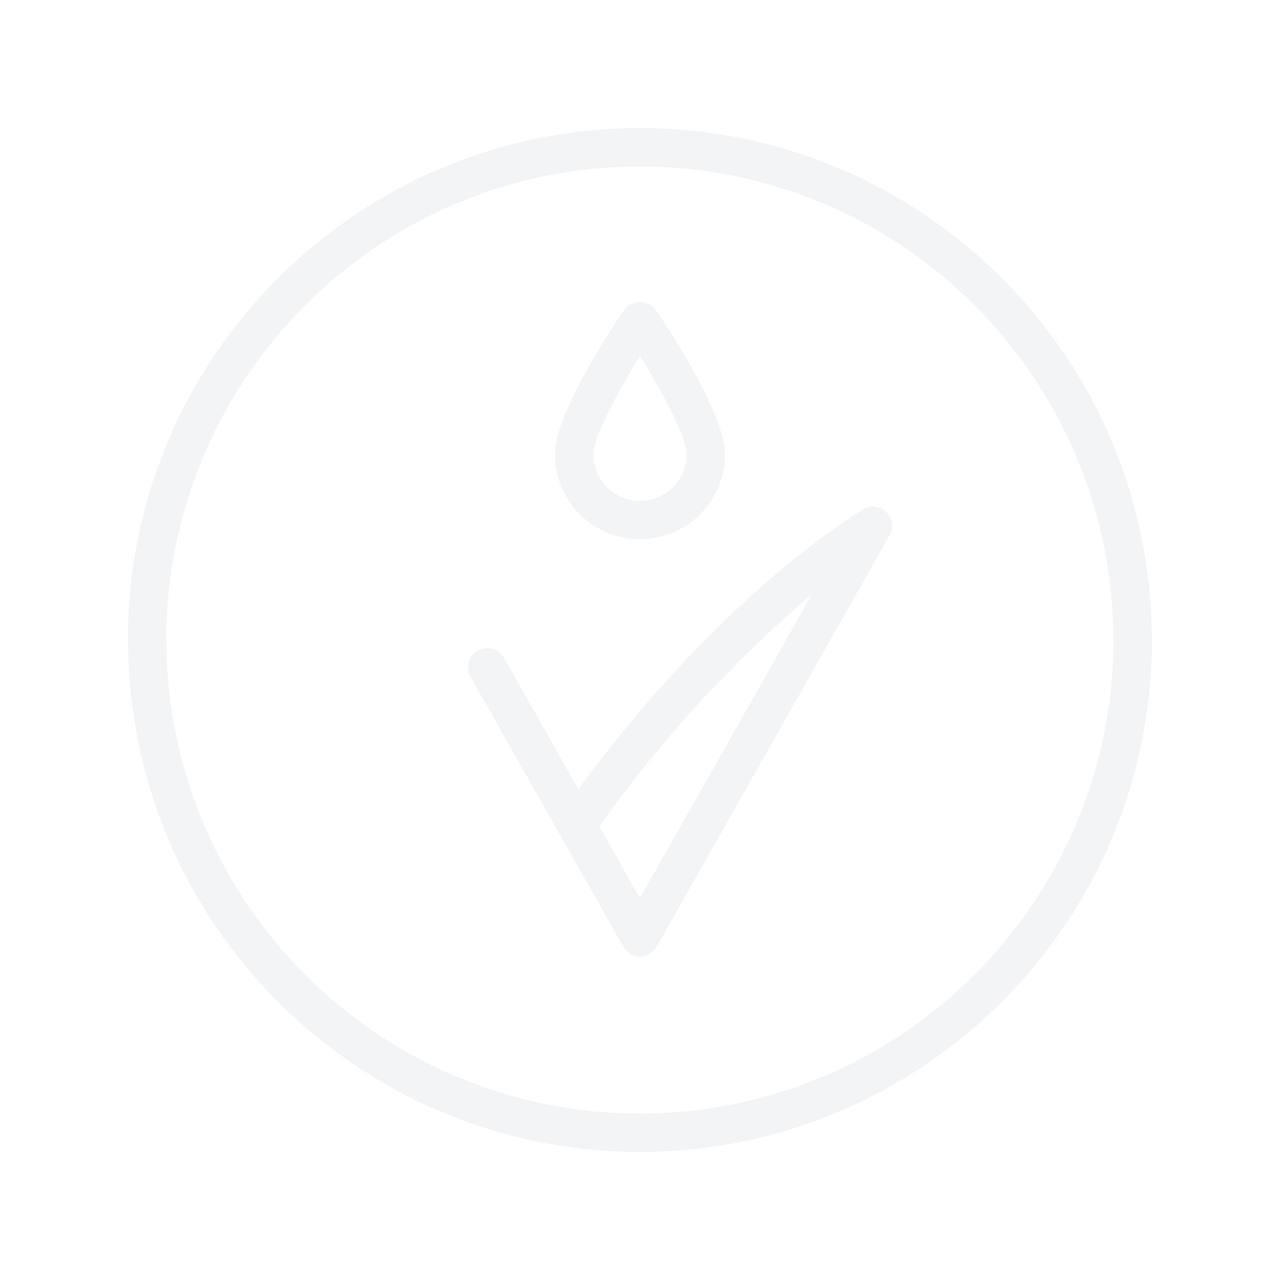 SESDERMA Mandelac Liposomal Serum 30ml